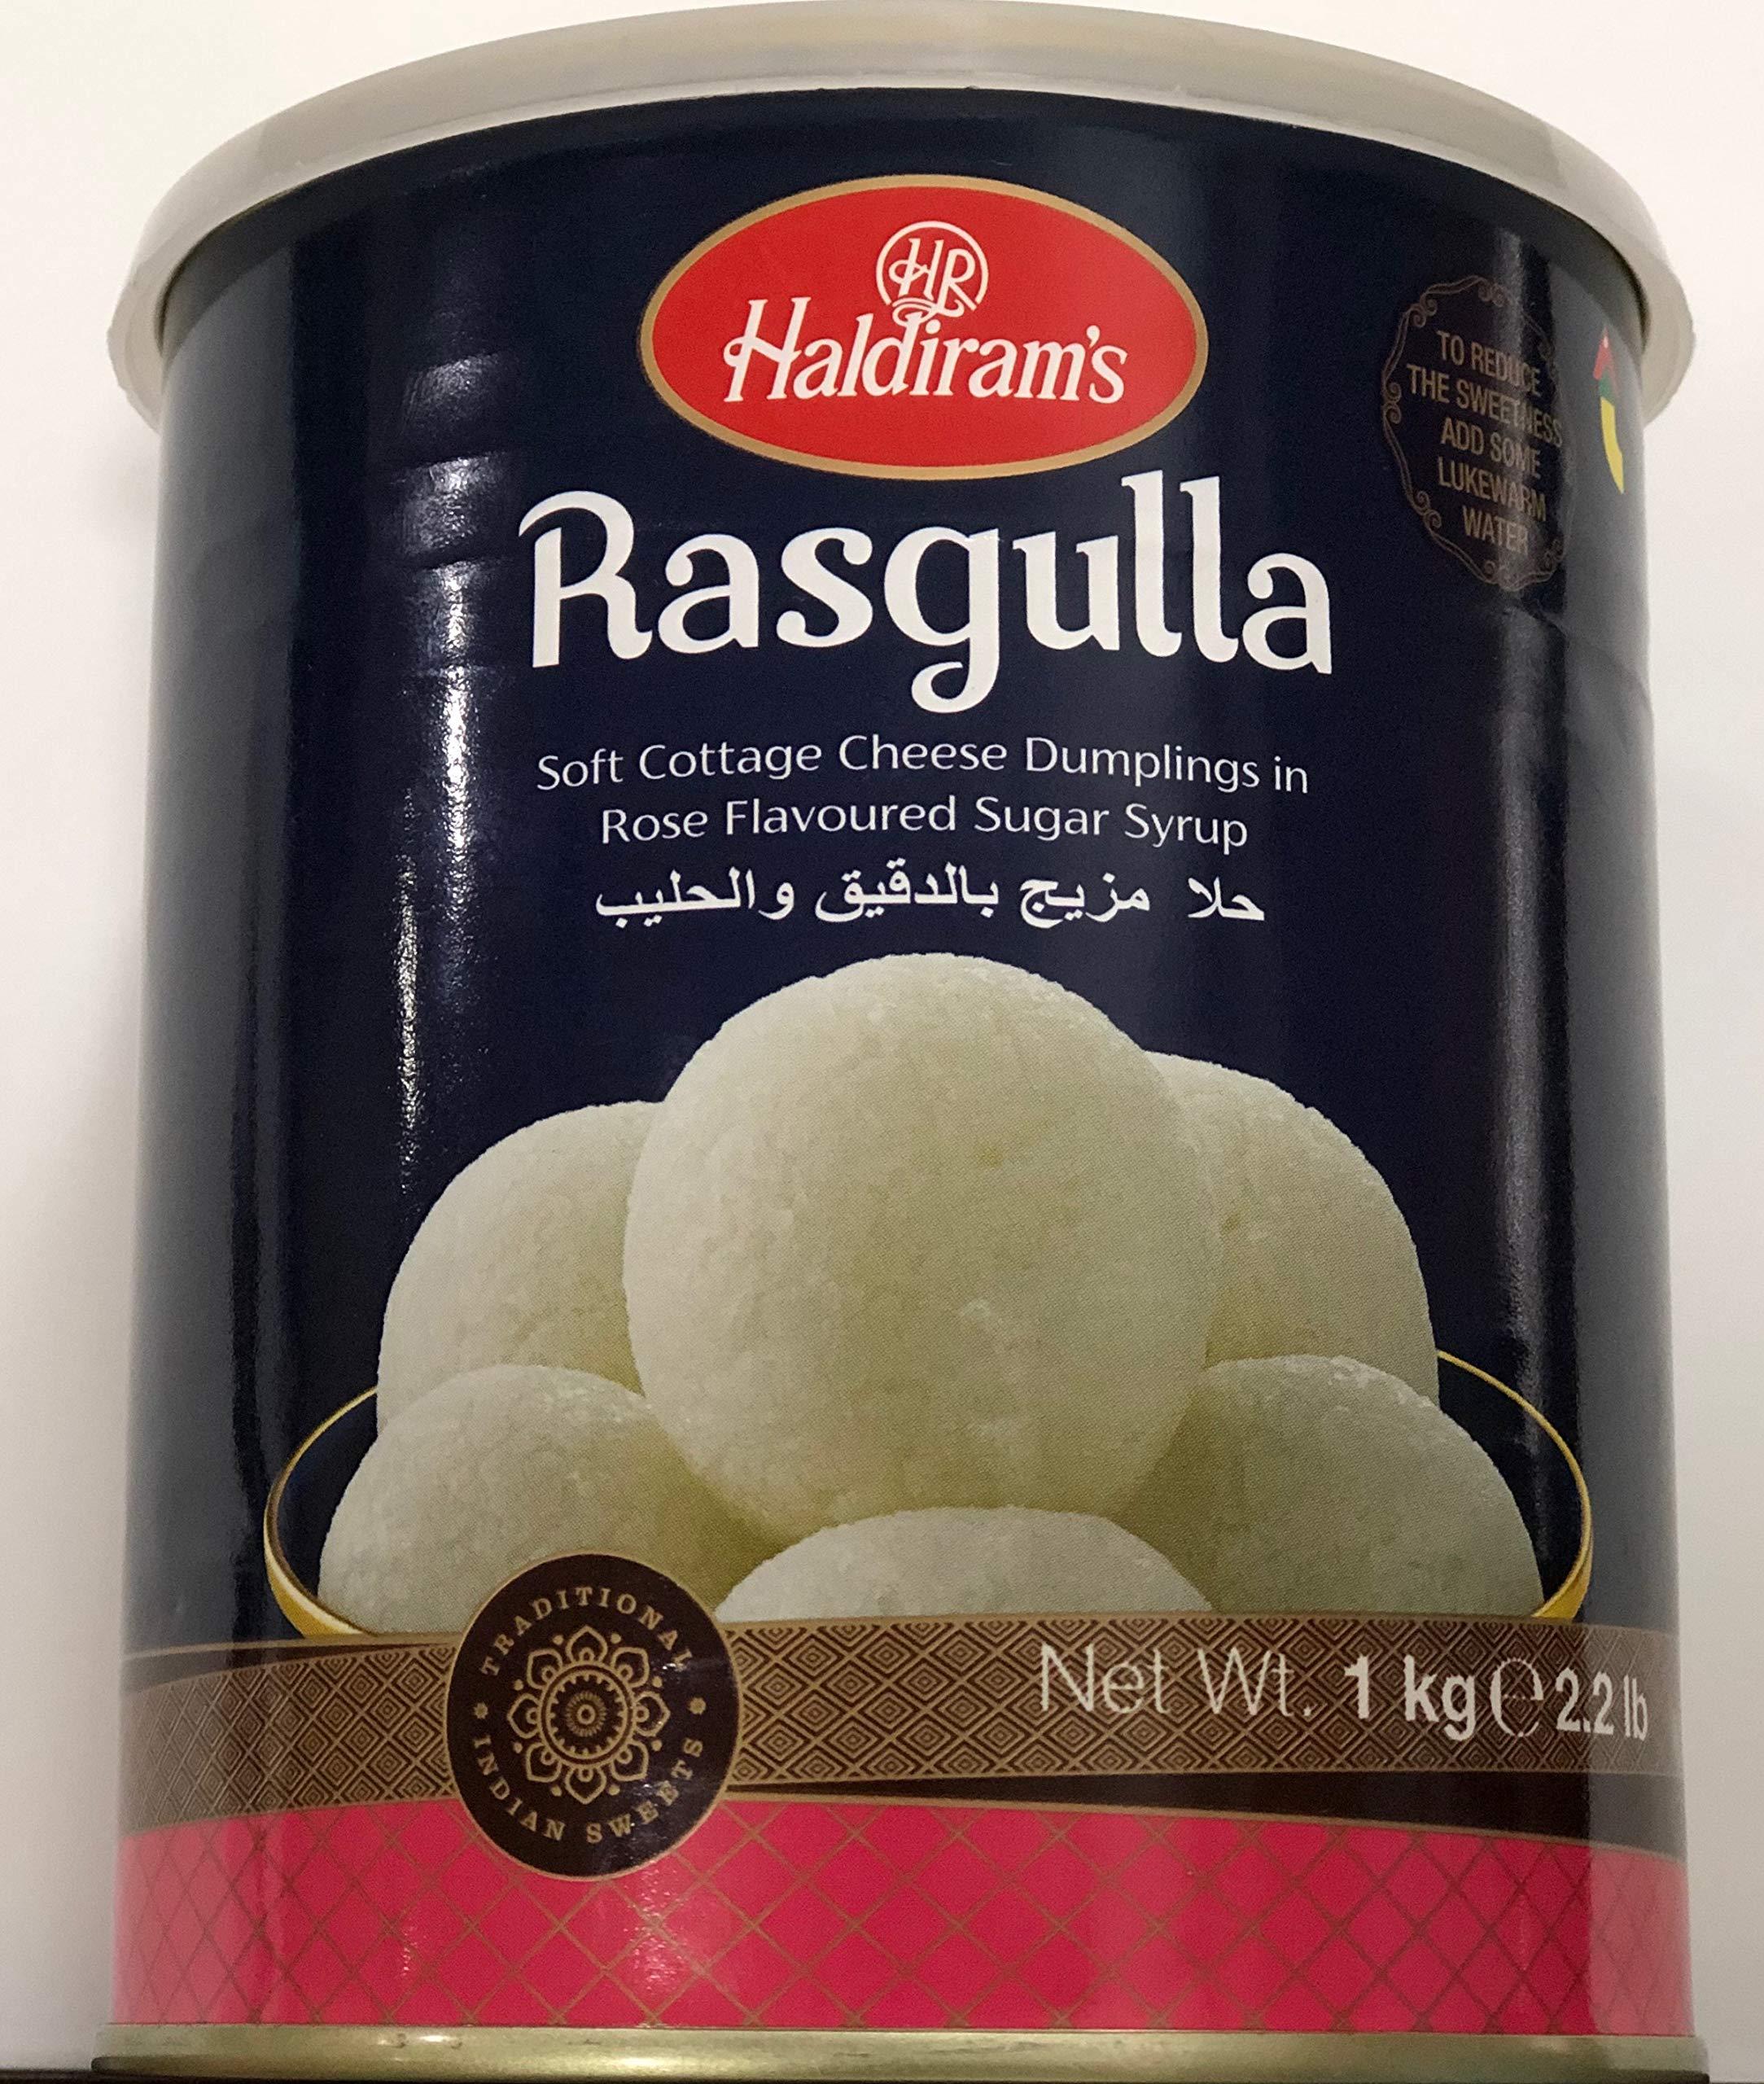 Haldirams Nagpur Rasgulla, 1kg